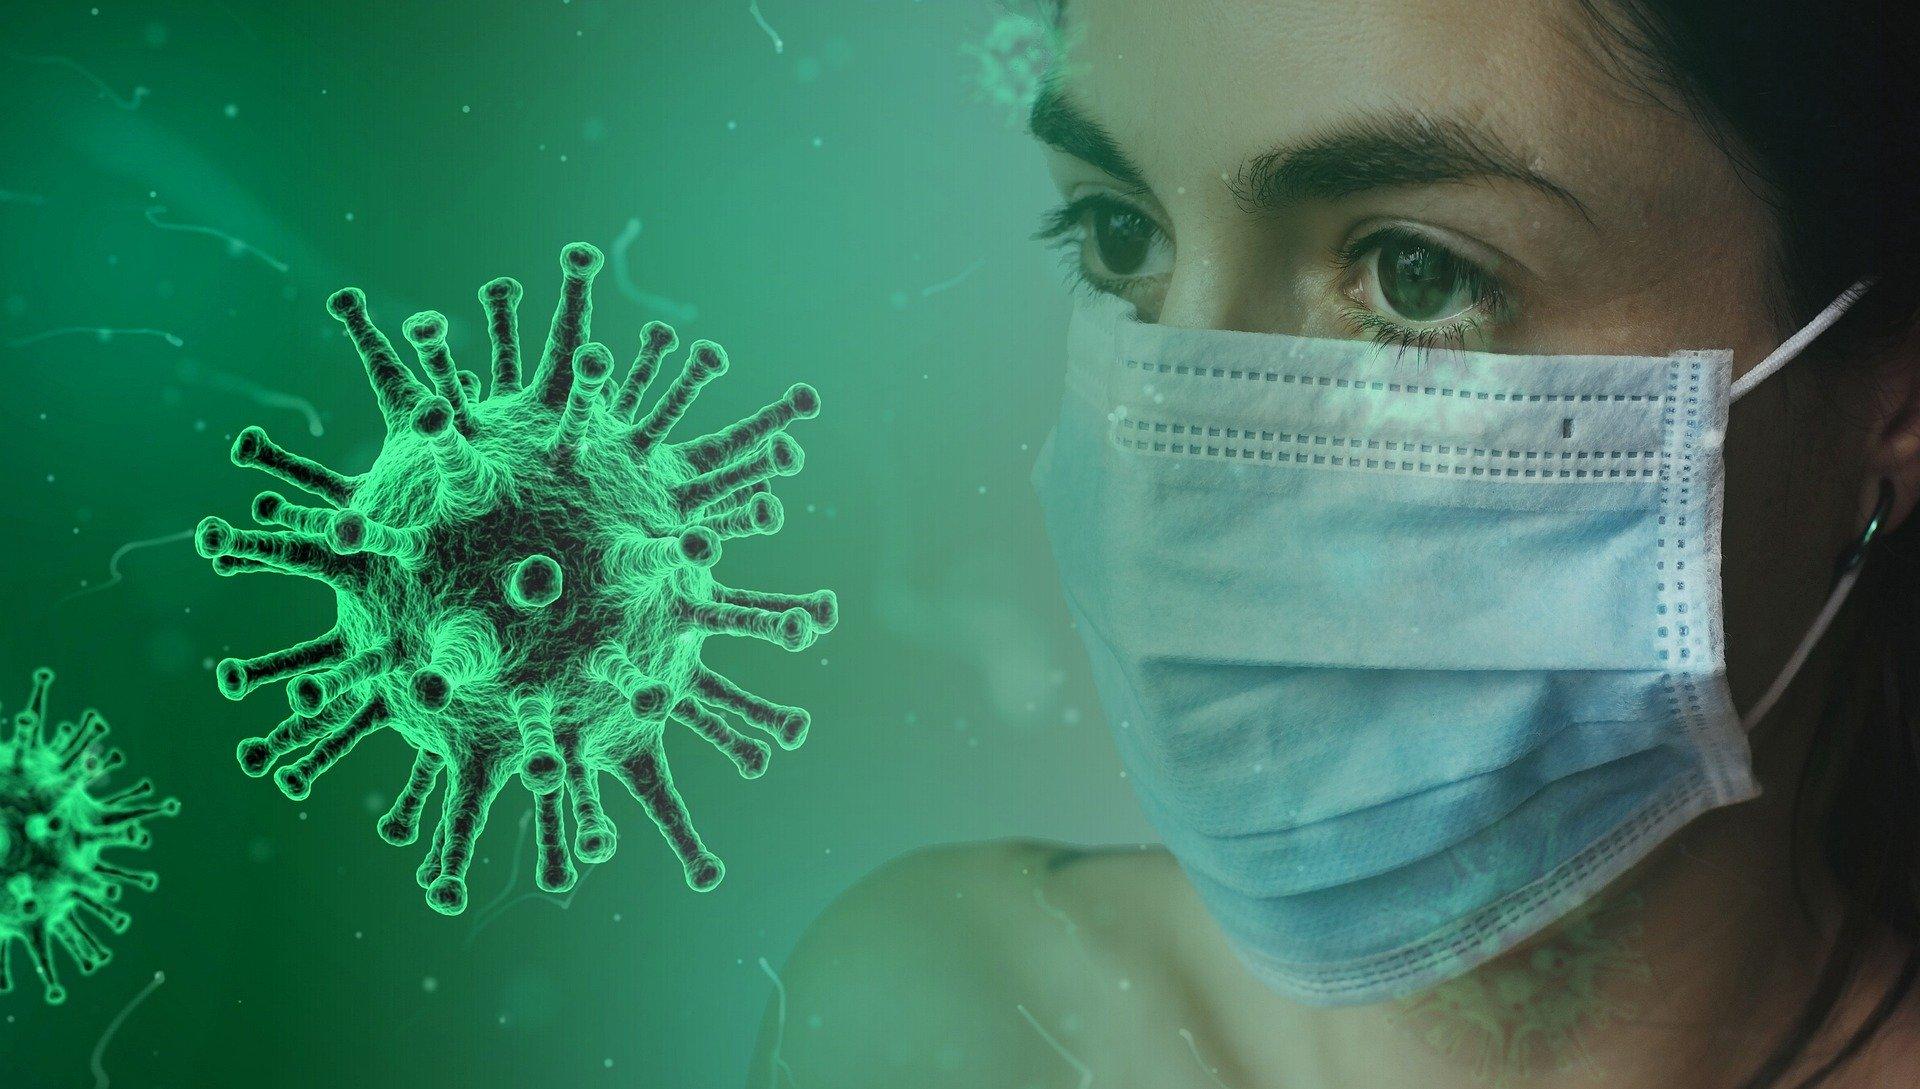 Ante la crisis del coronavirus COVID-19, GRACIAS